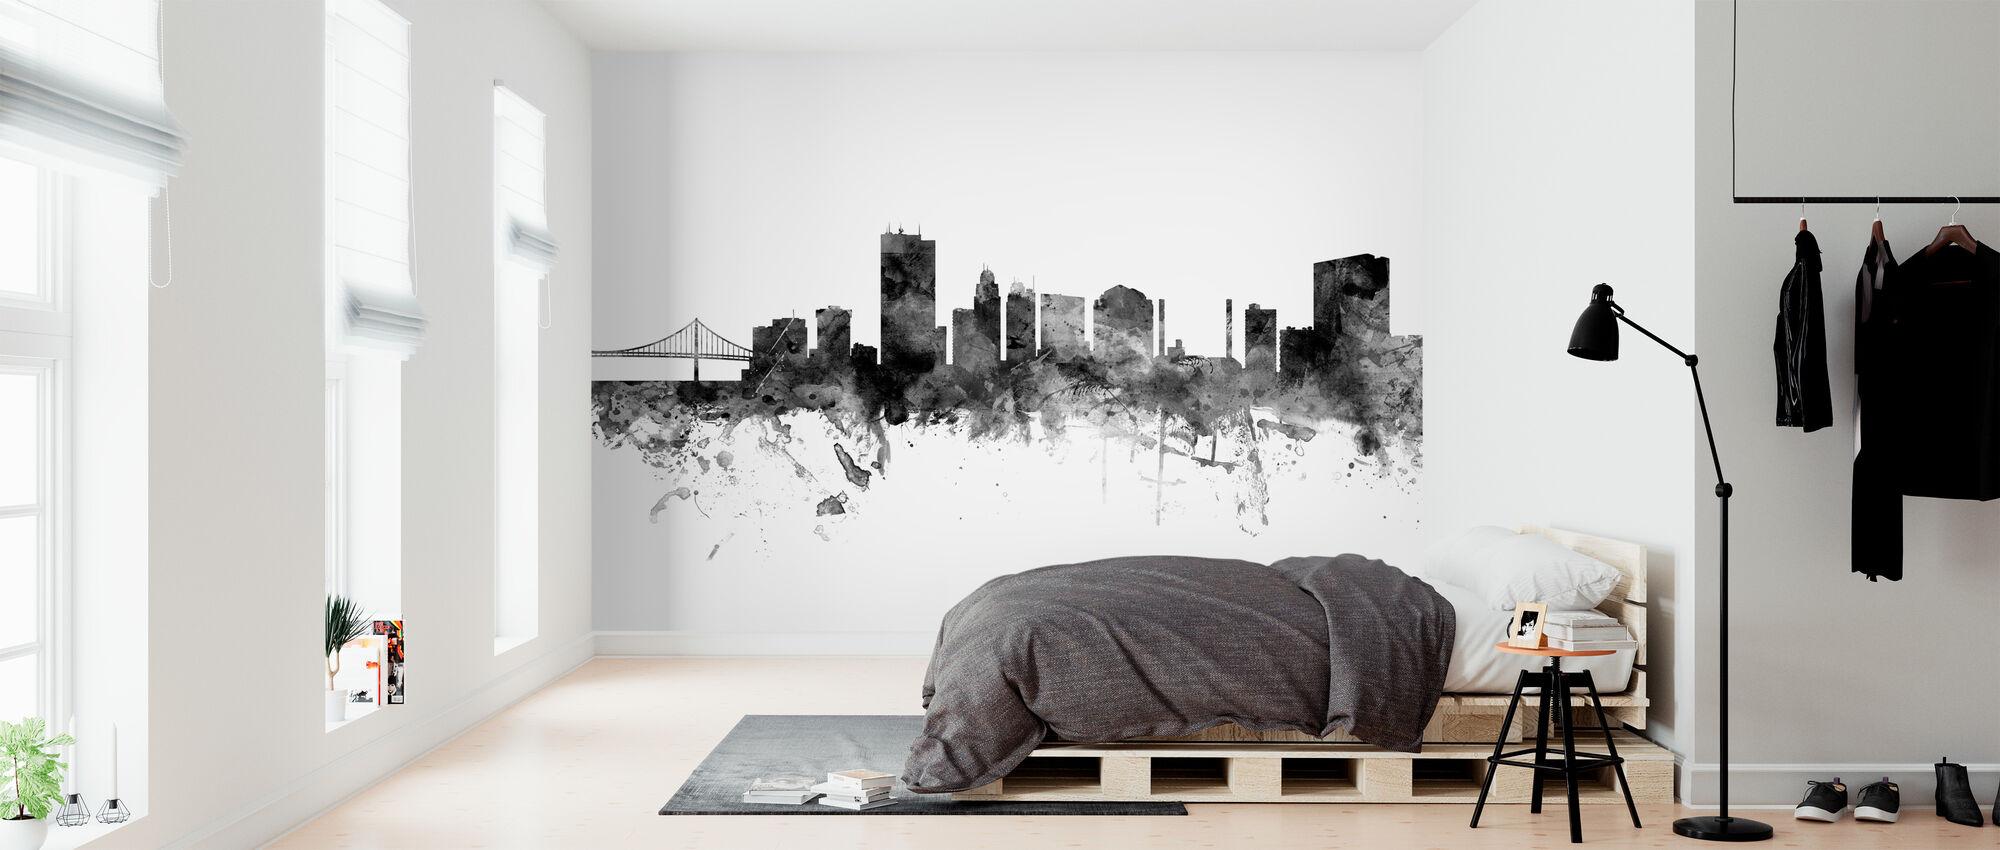 Toledo Ohio Skyline, black and white - Wallpaper - Bedroom